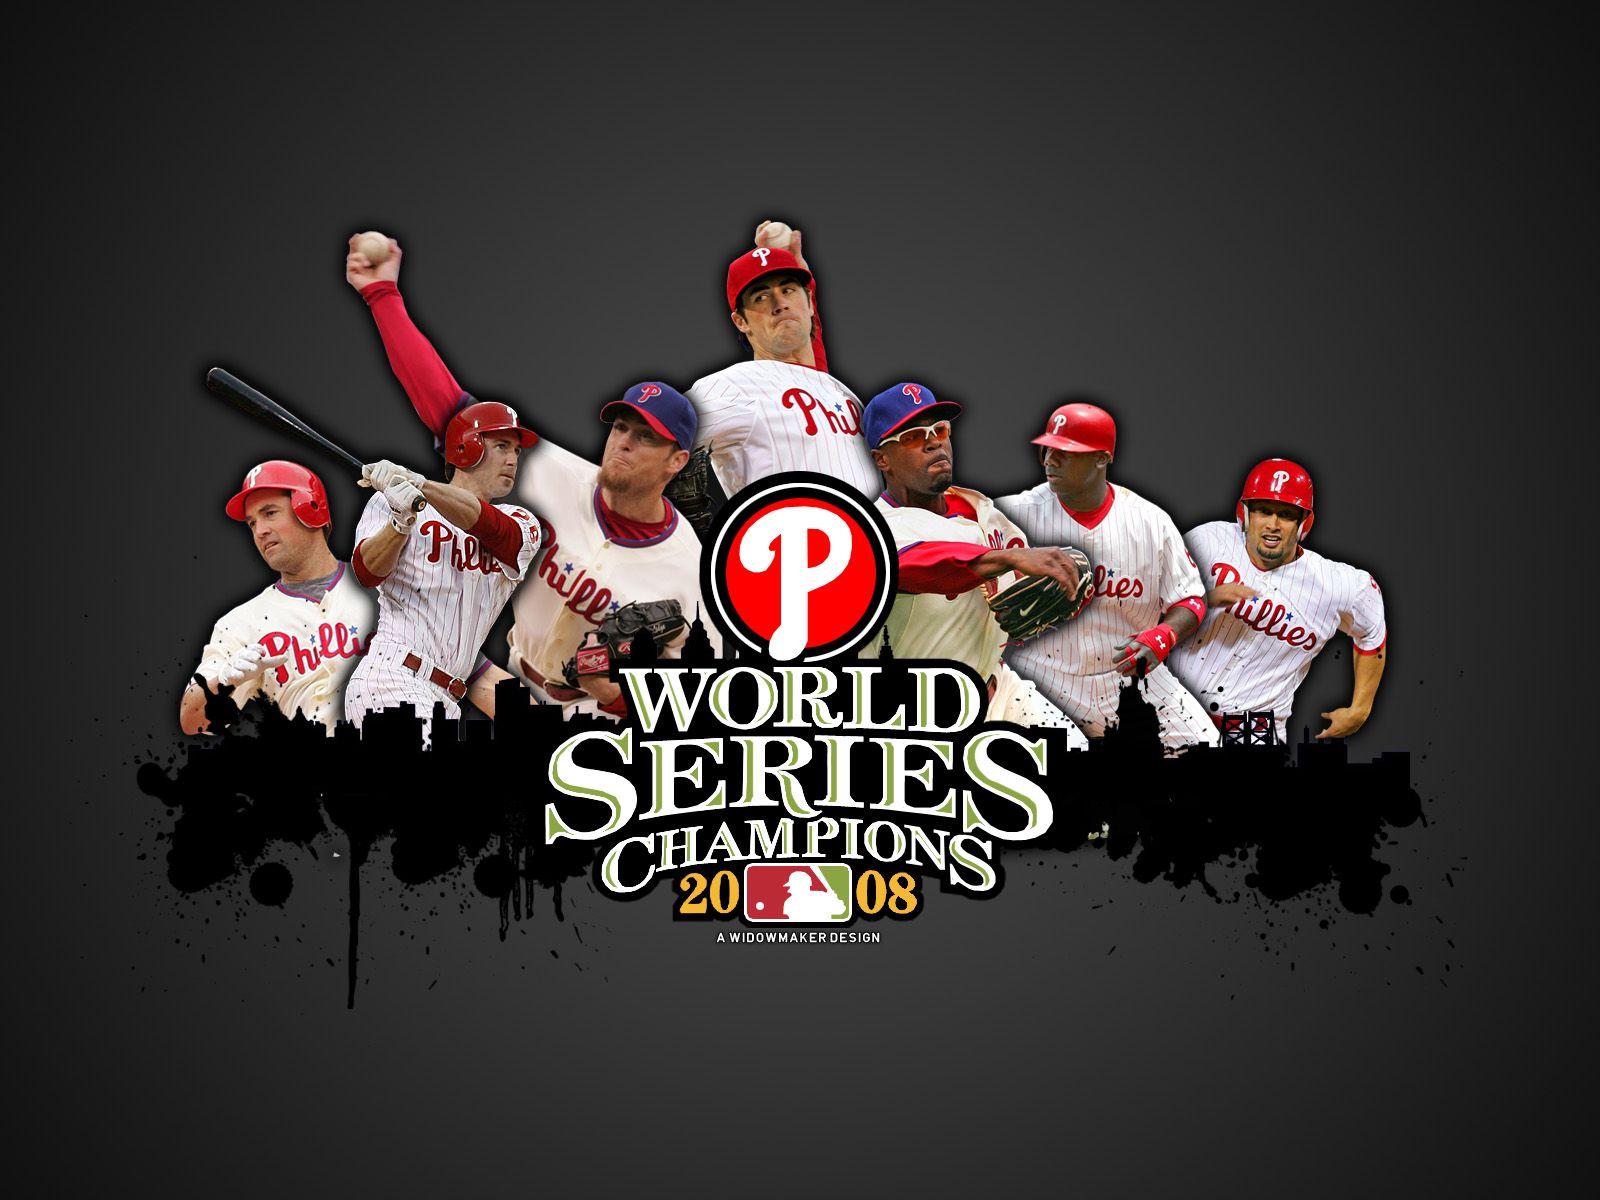 2008 World Series Champs Philadelphia Phillies Philadelphia Phillies Baseball Phillies